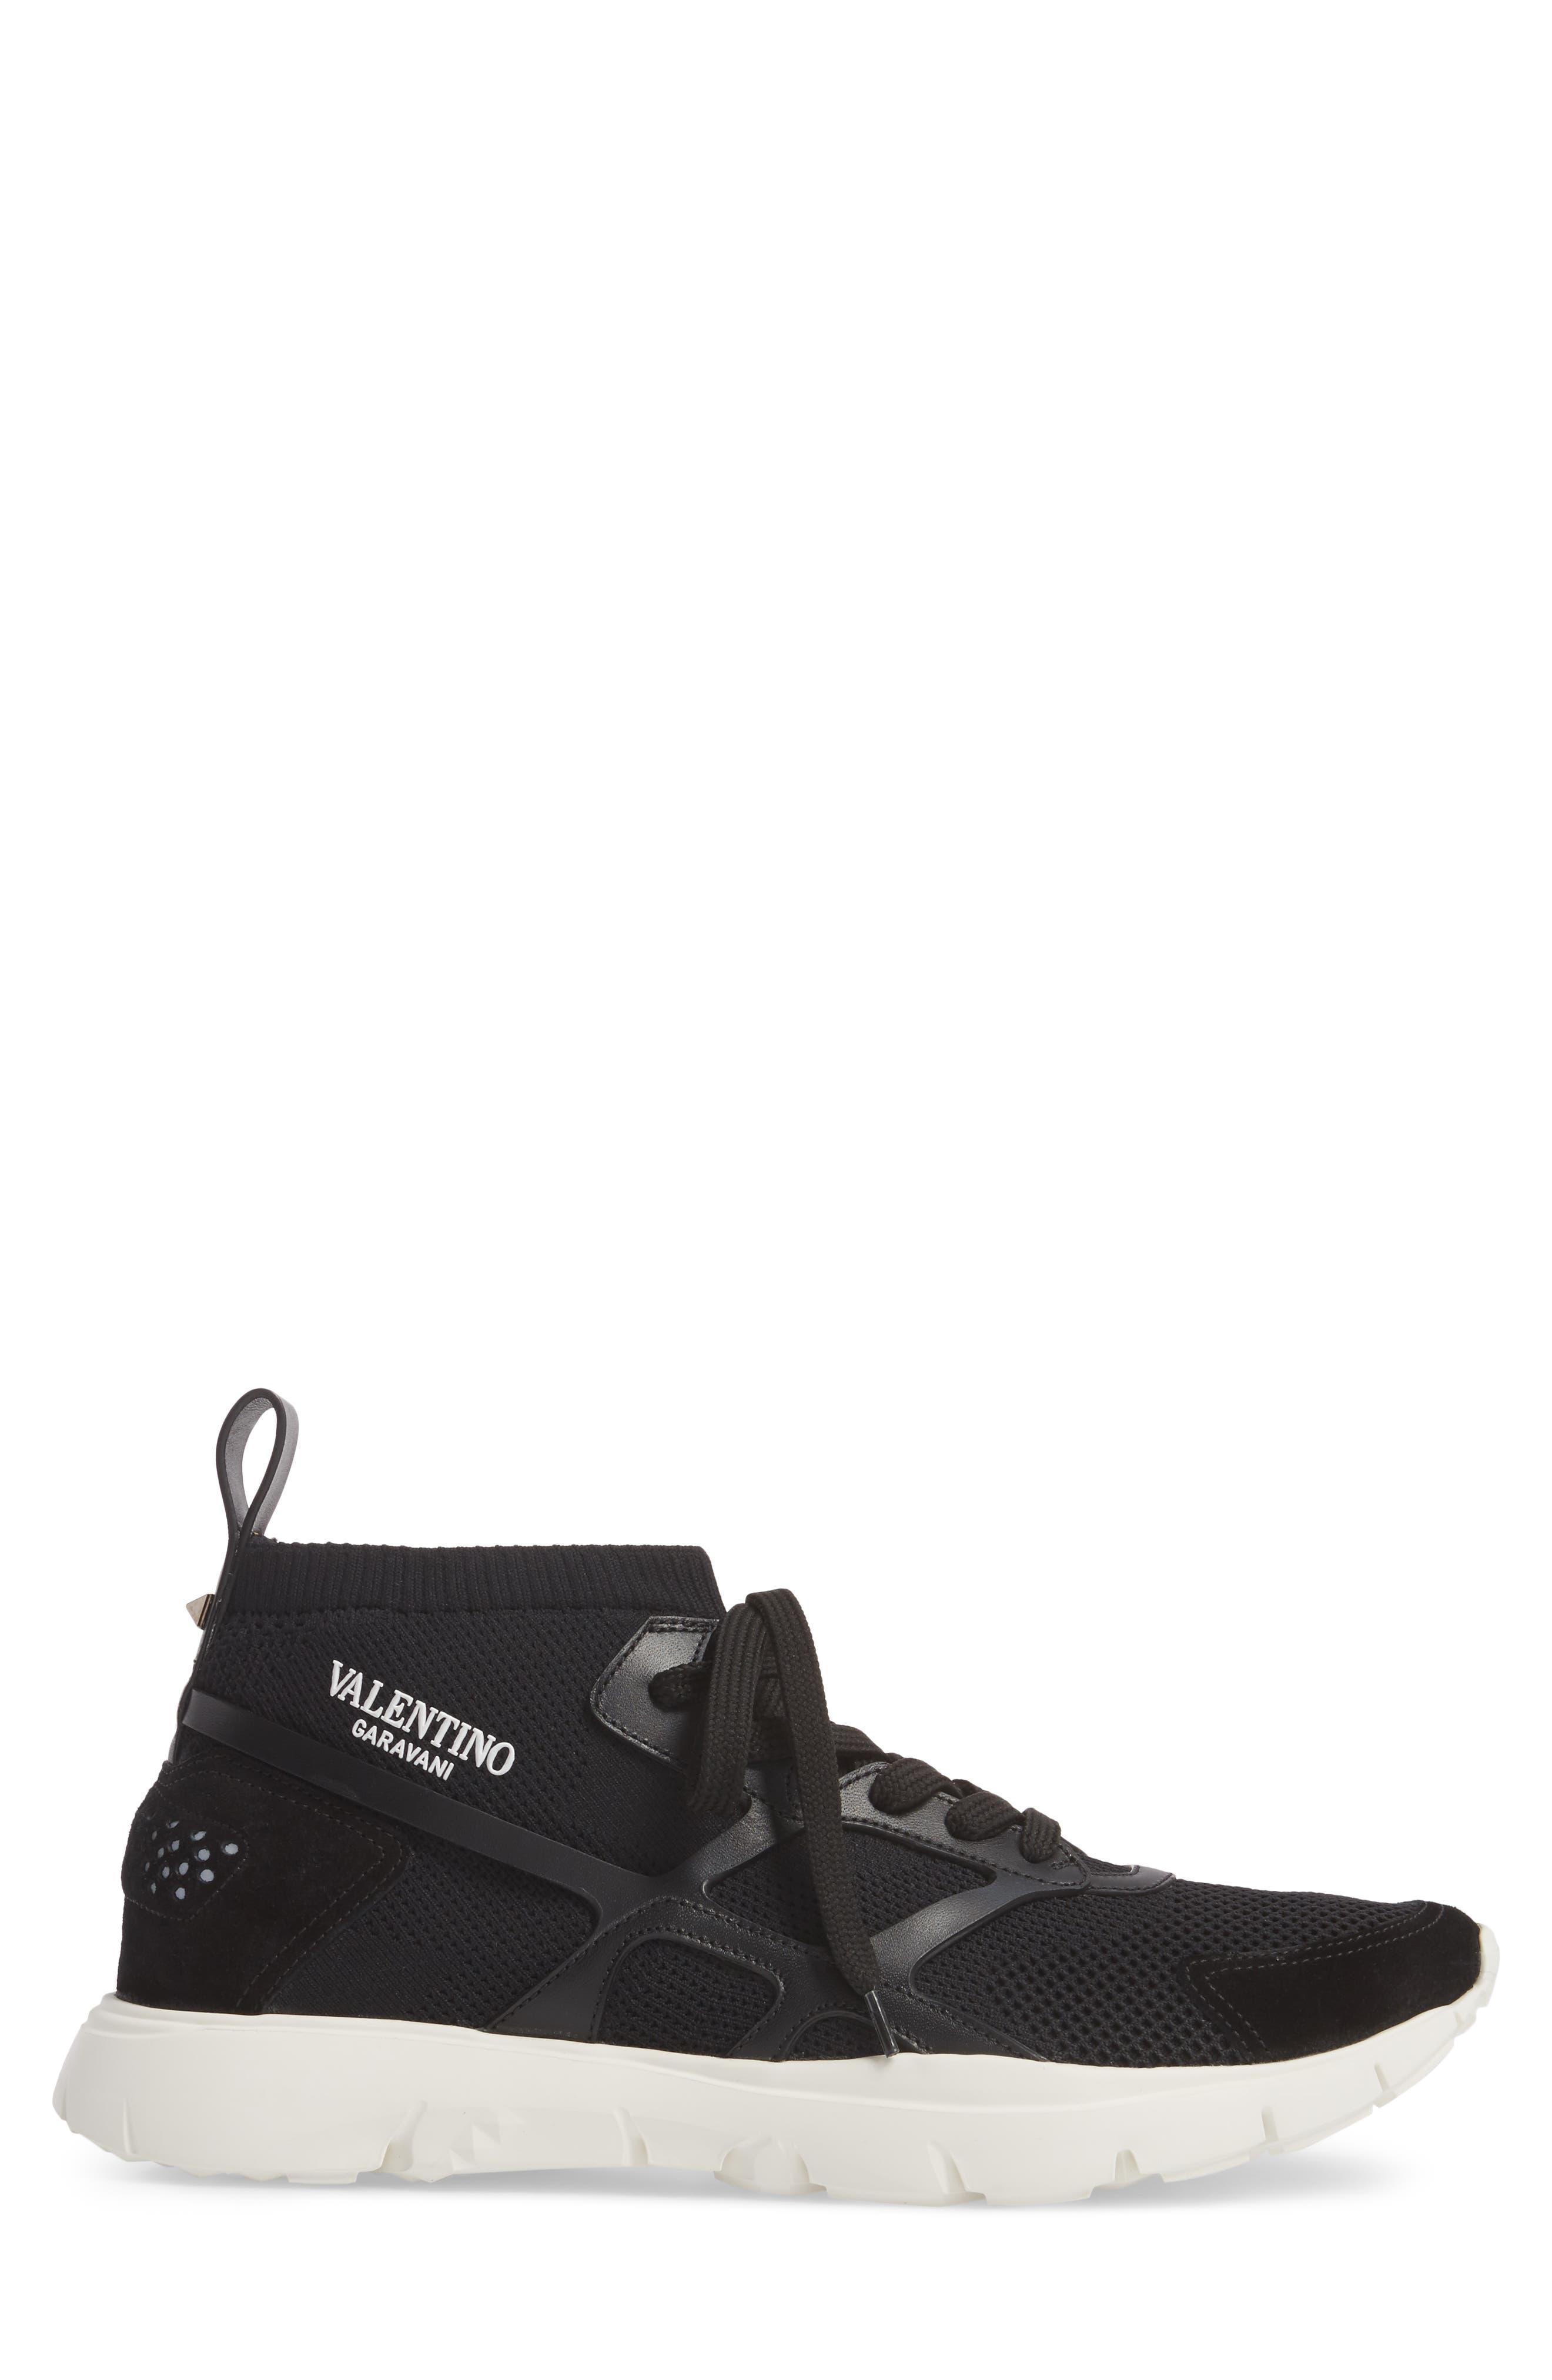 Sound High Sneaker,                             Alternate thumbnail 3, color,                             Nero